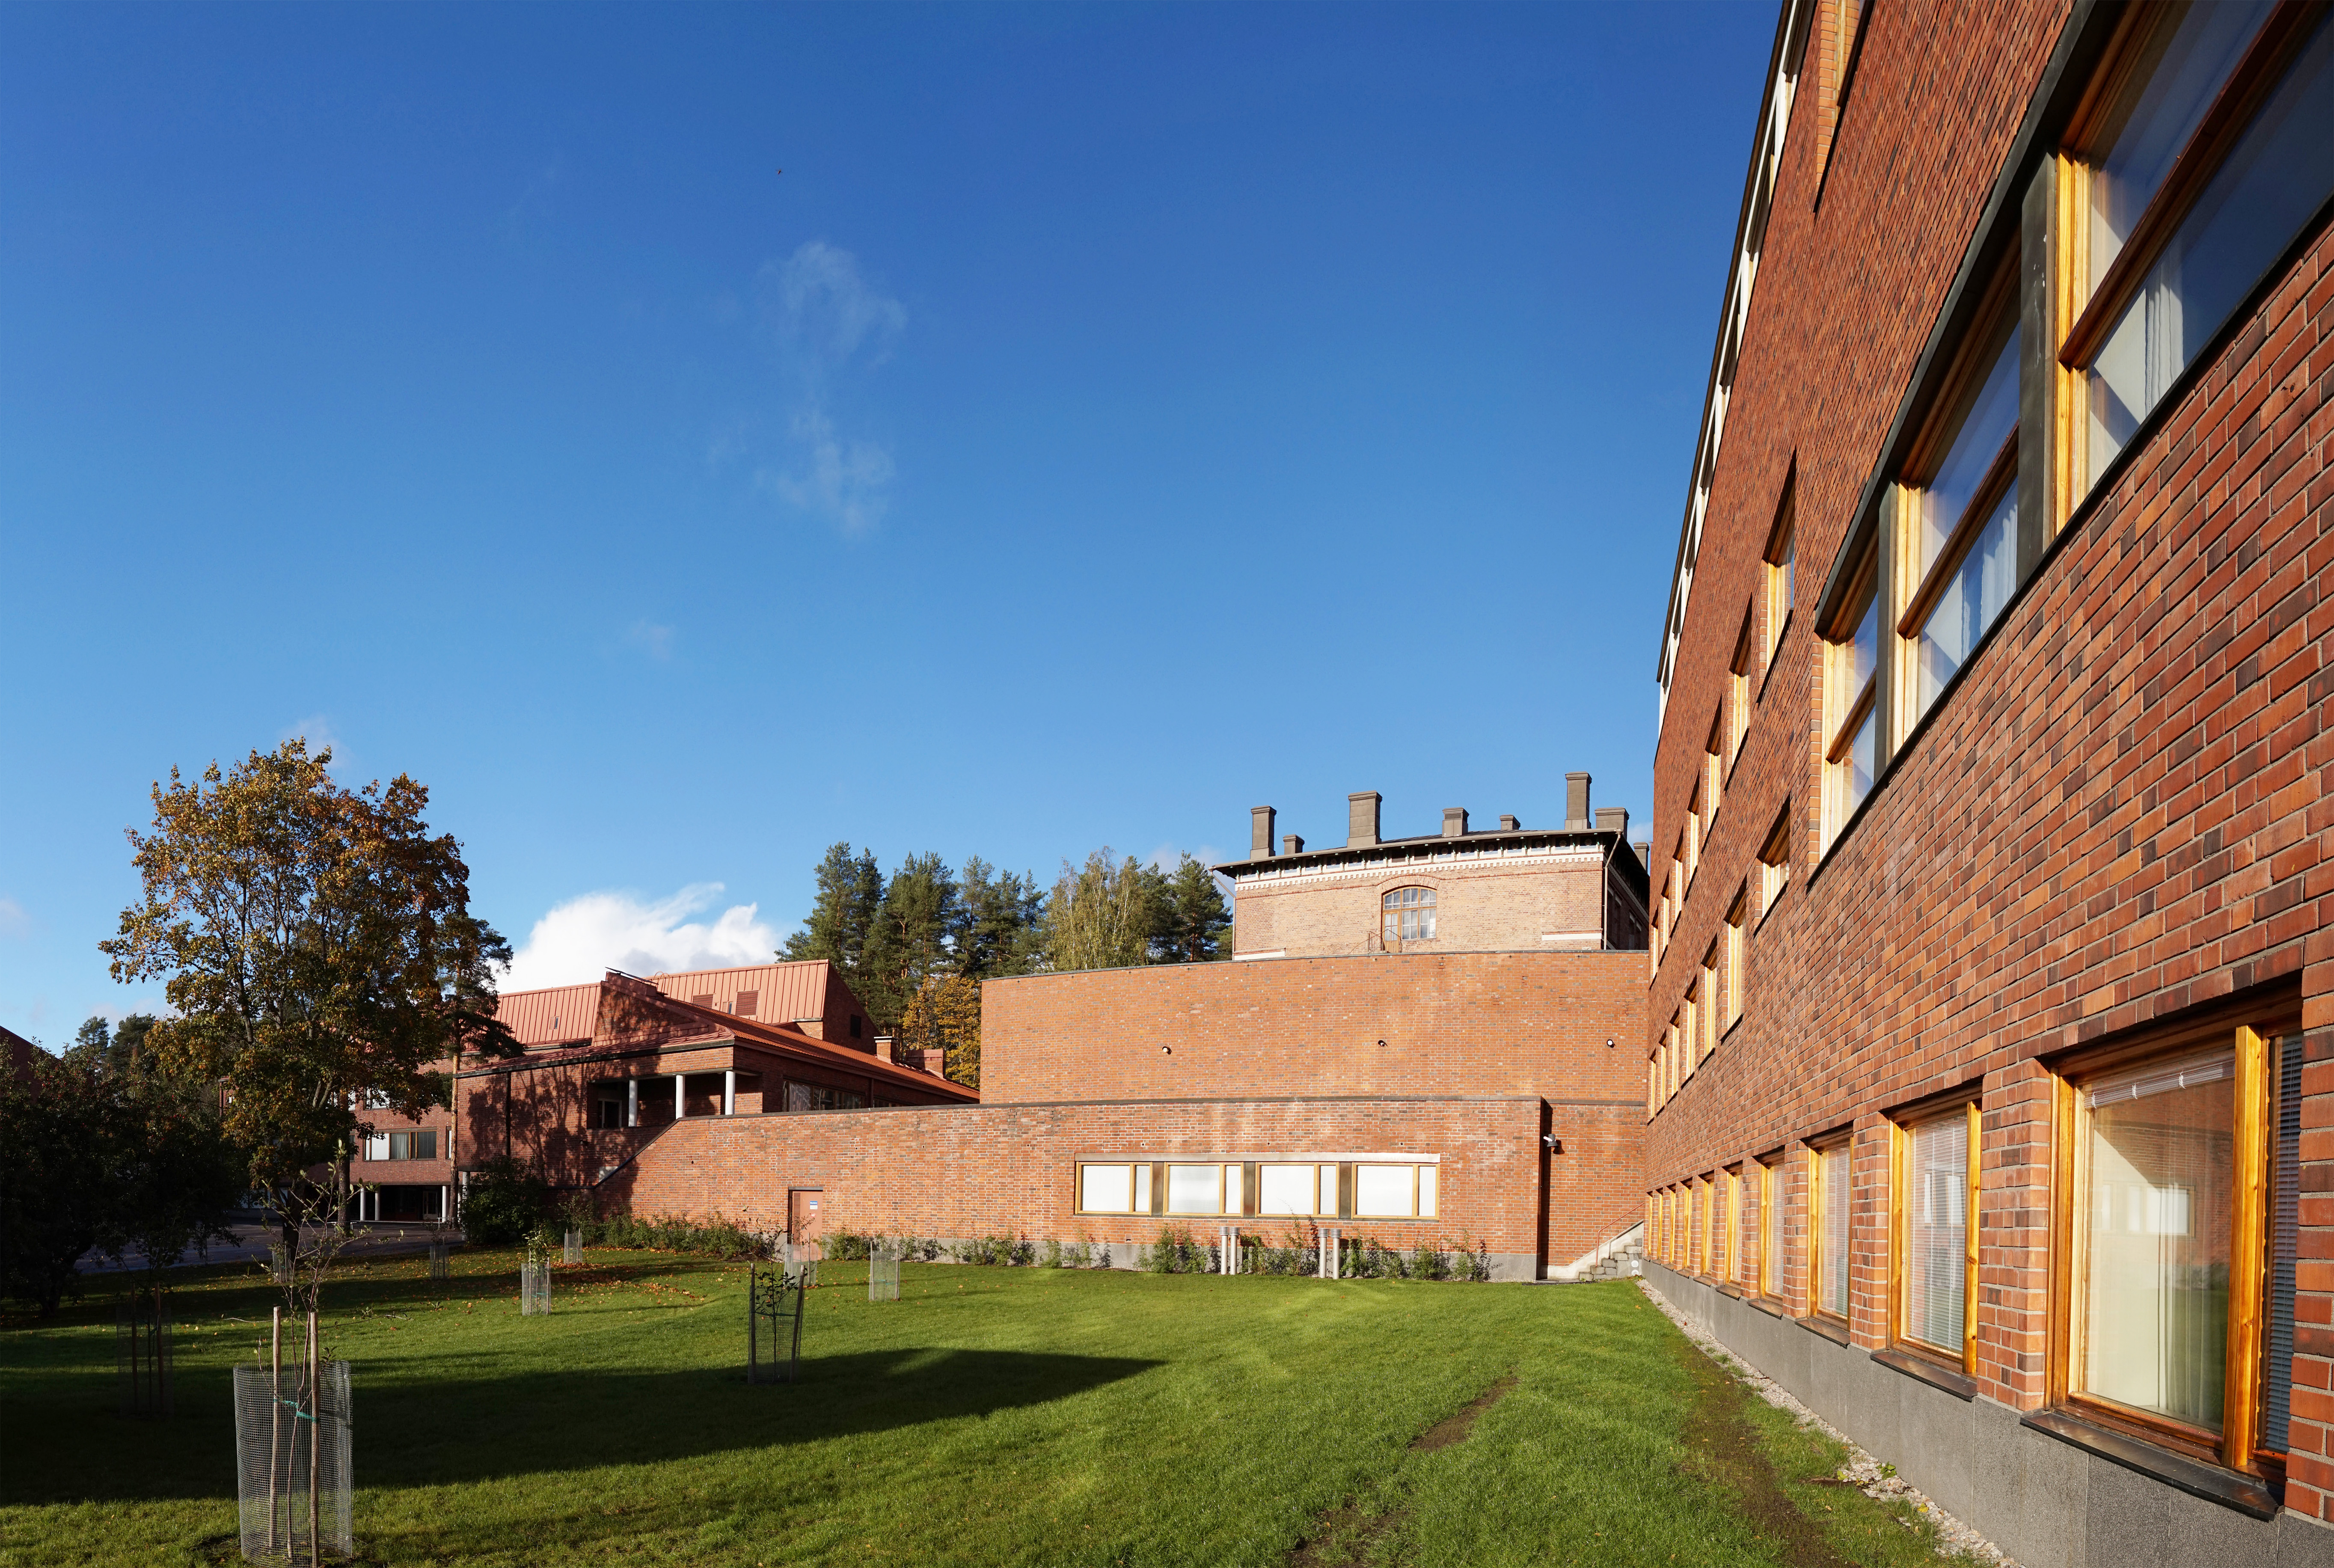 Seminaarinmäki campus 2.jpg